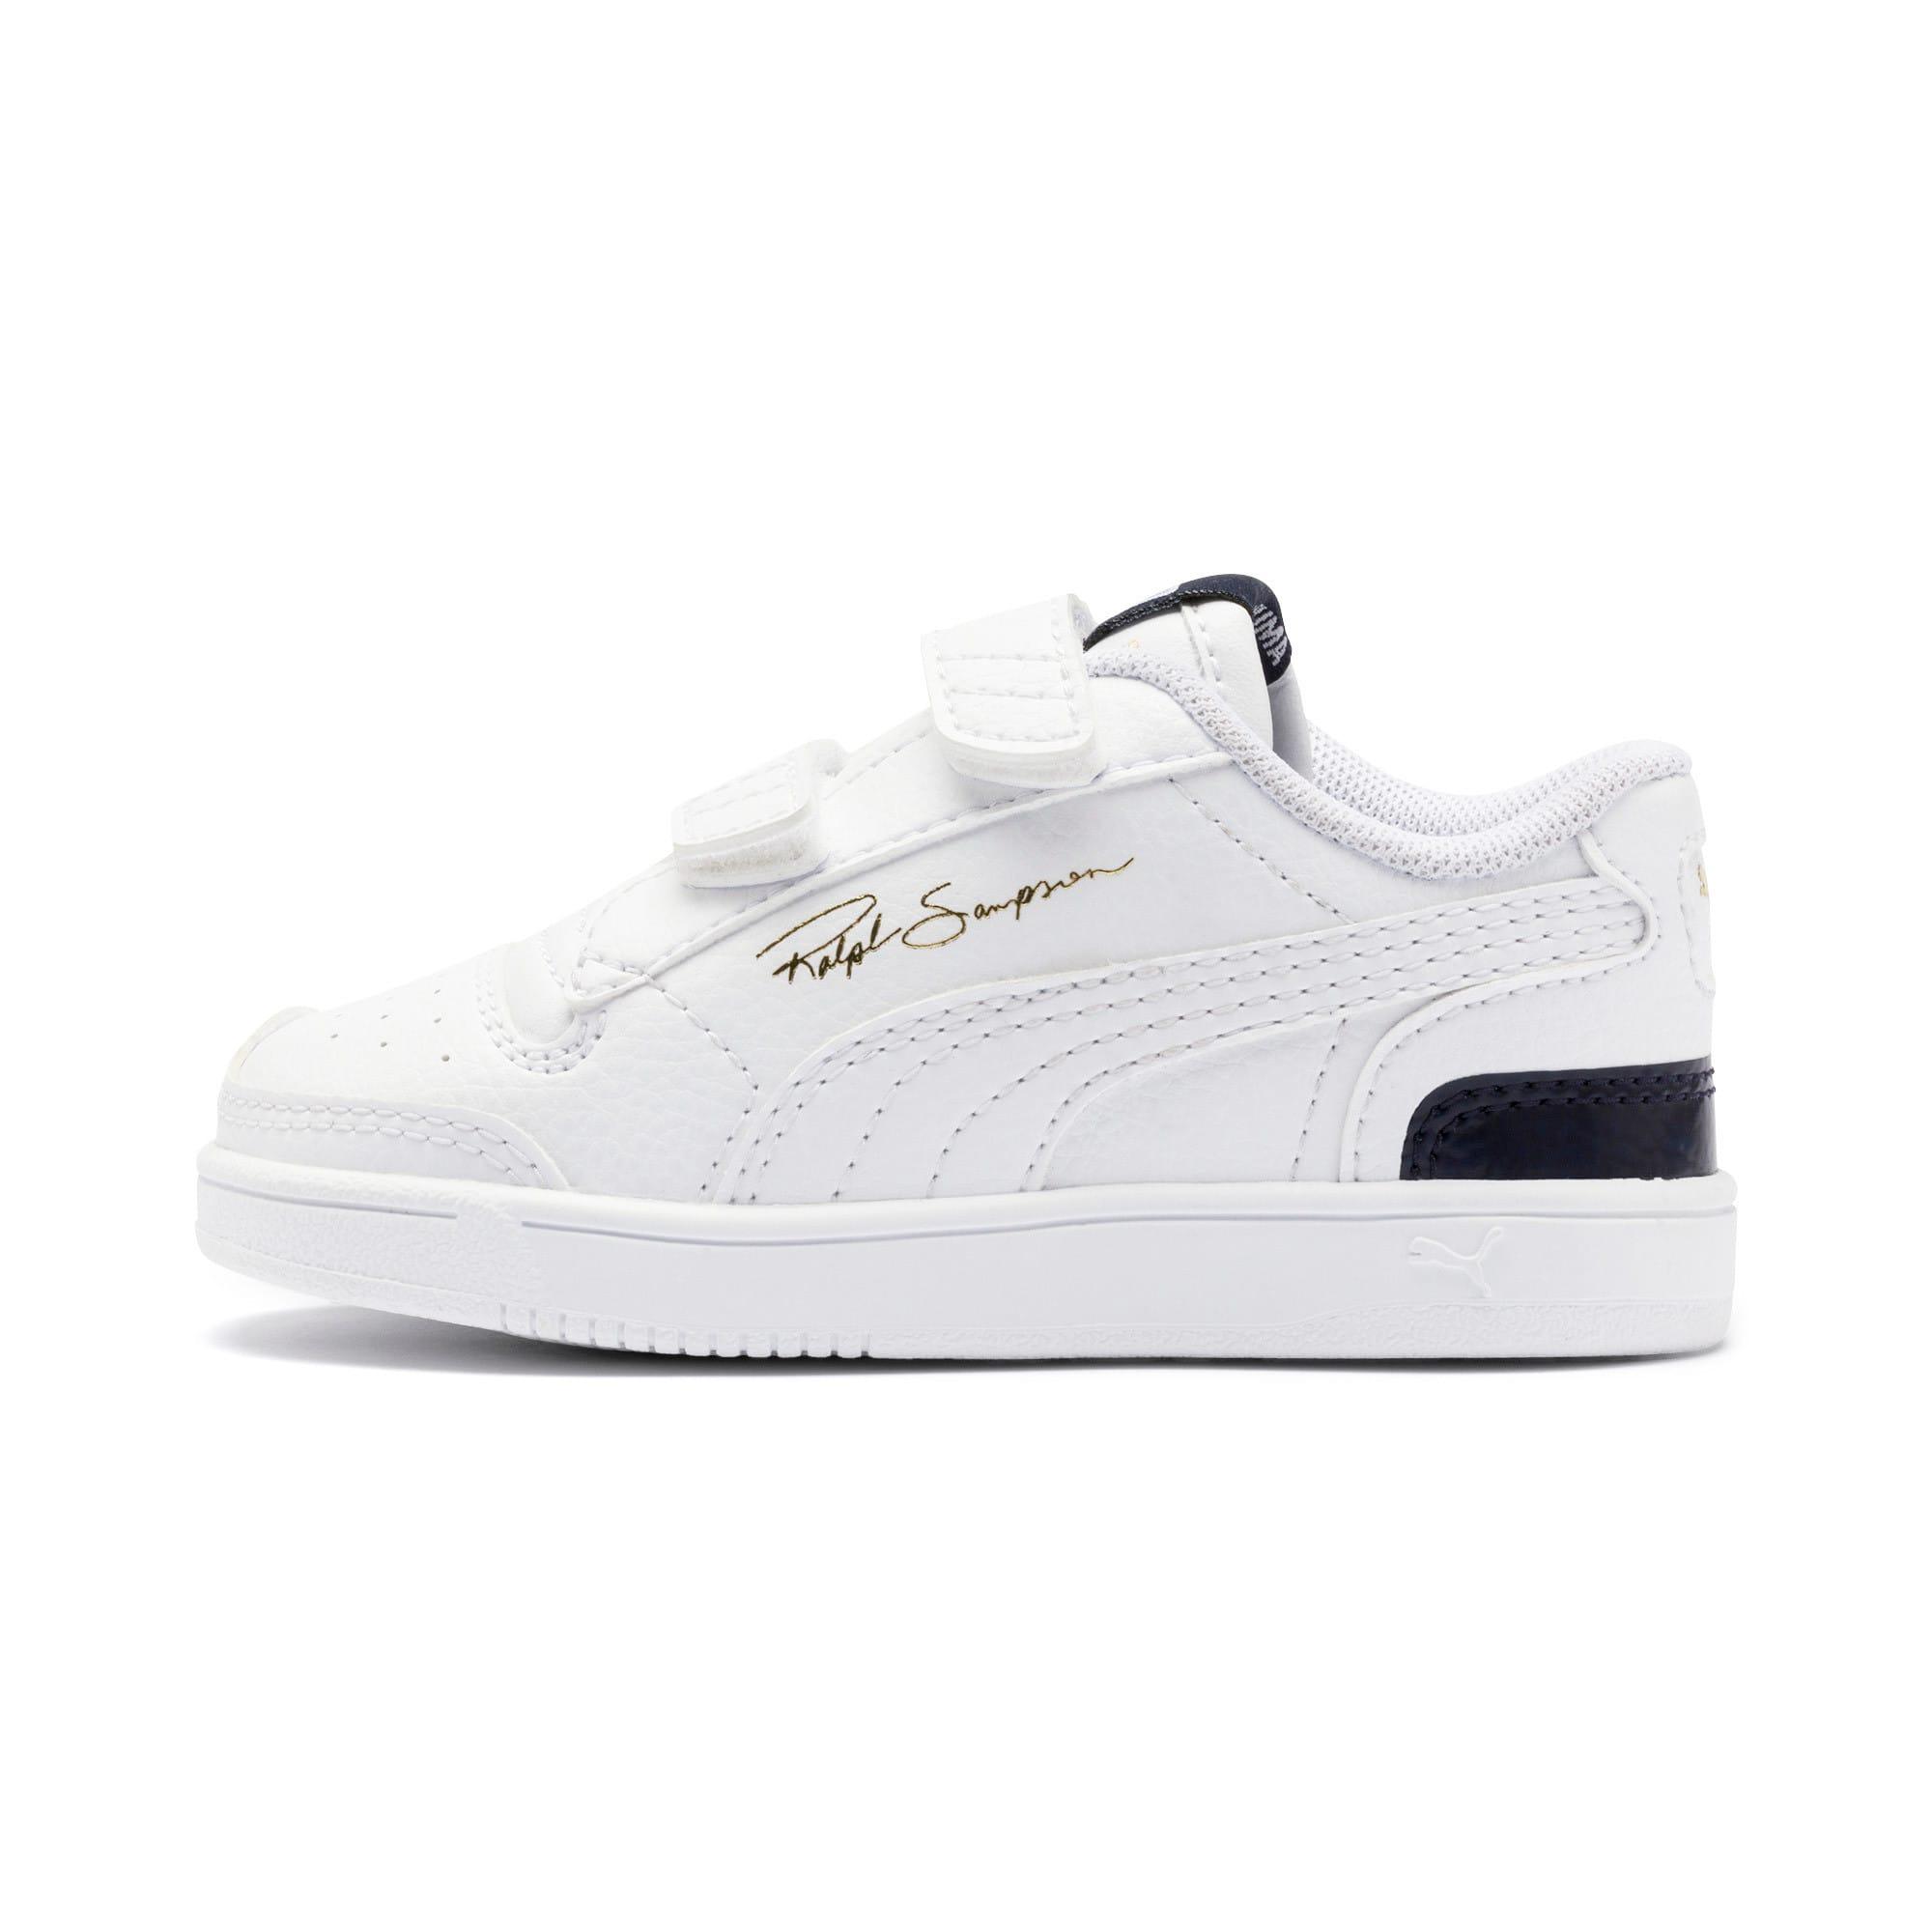 Thumbnail 1 of Ralph Sampson Low AC Toddler Shoes, White-Peacoat-White, medium